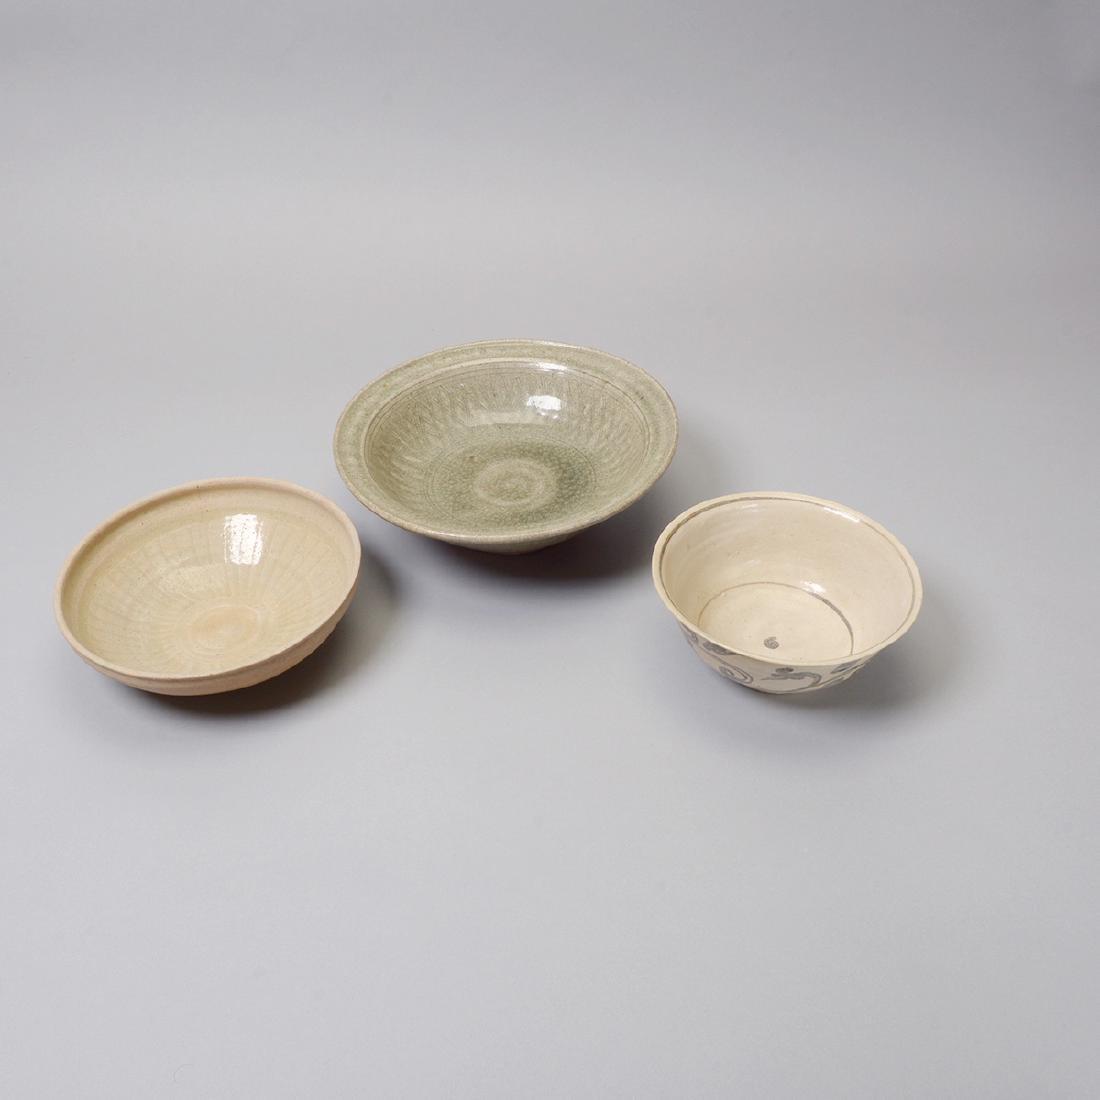 Large Group of Thai Glazed Ceramics, 7th - 16th C - 5